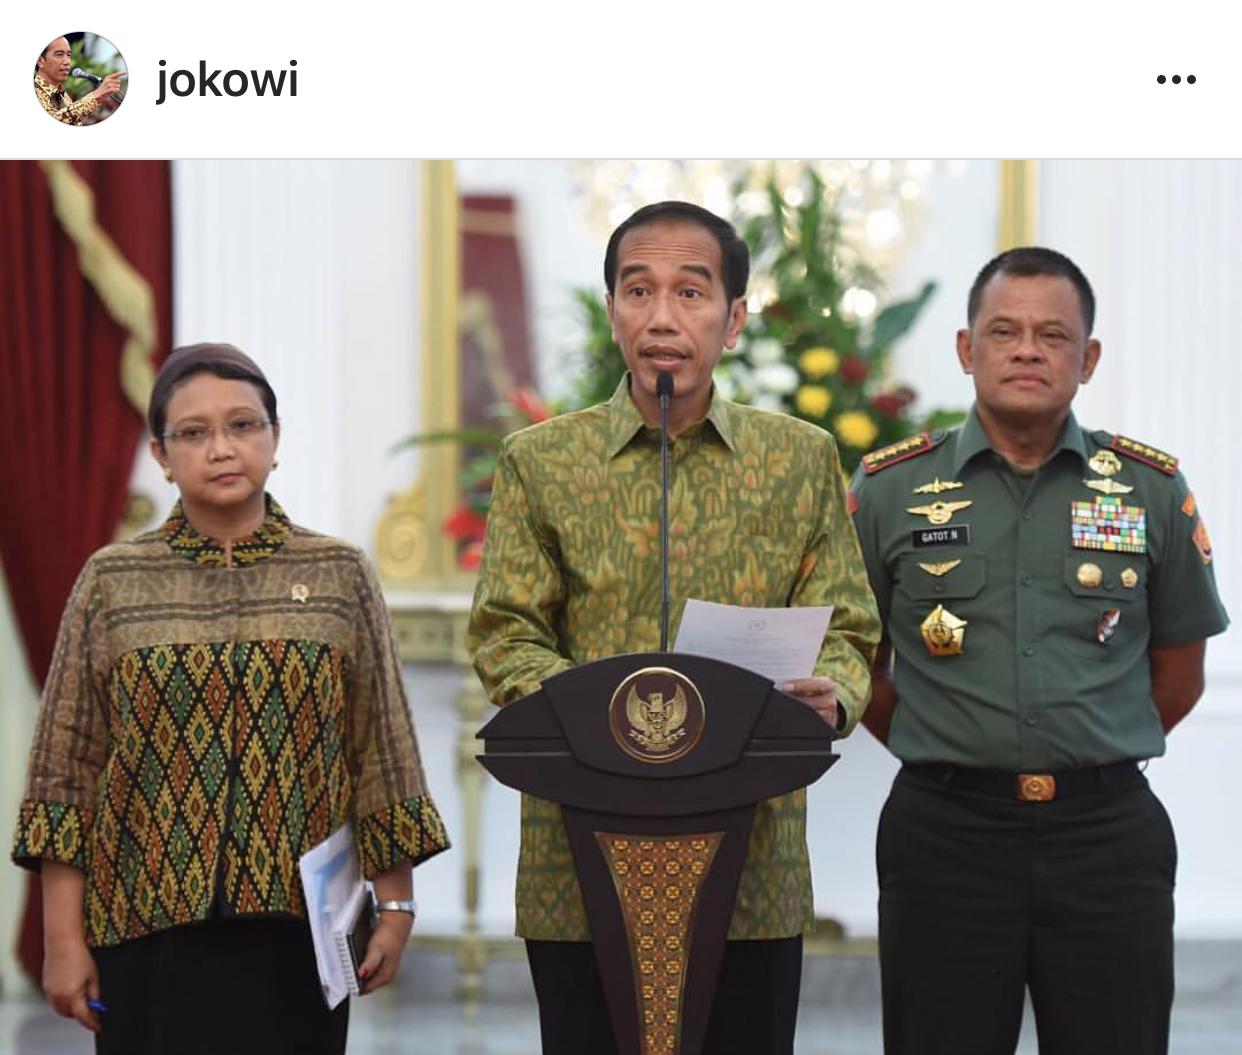 Foreign Minister Retno Marsudi's Fashion Diplomacy: Second